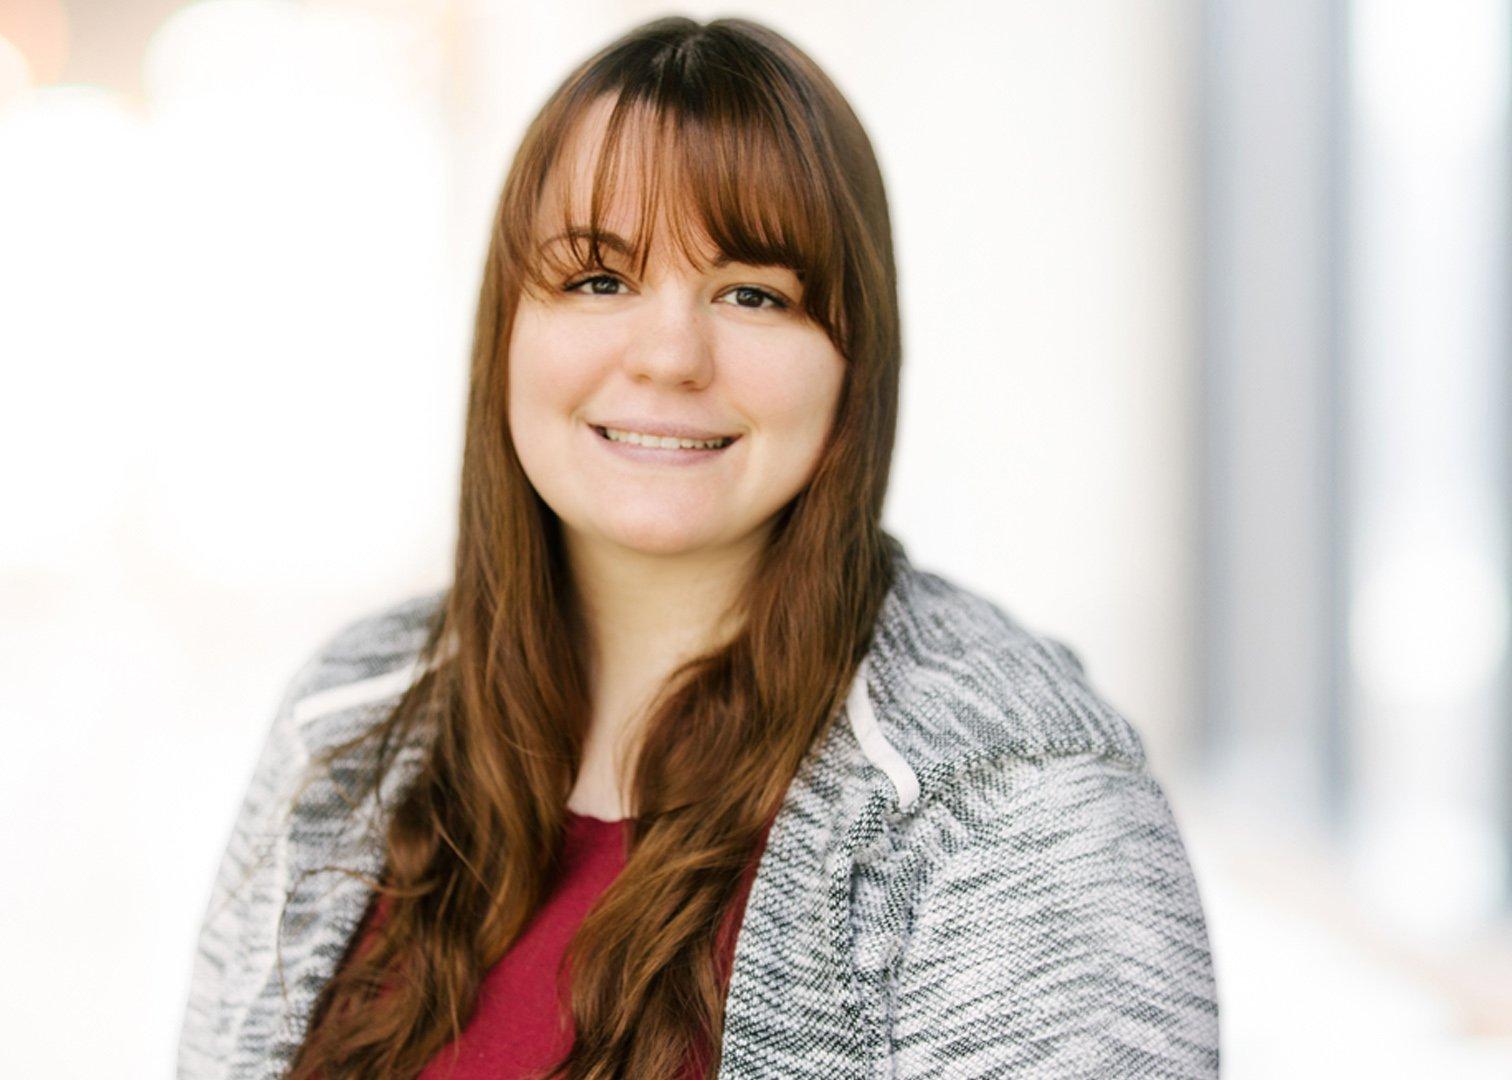 Jessica Jones - Operations Program Manager